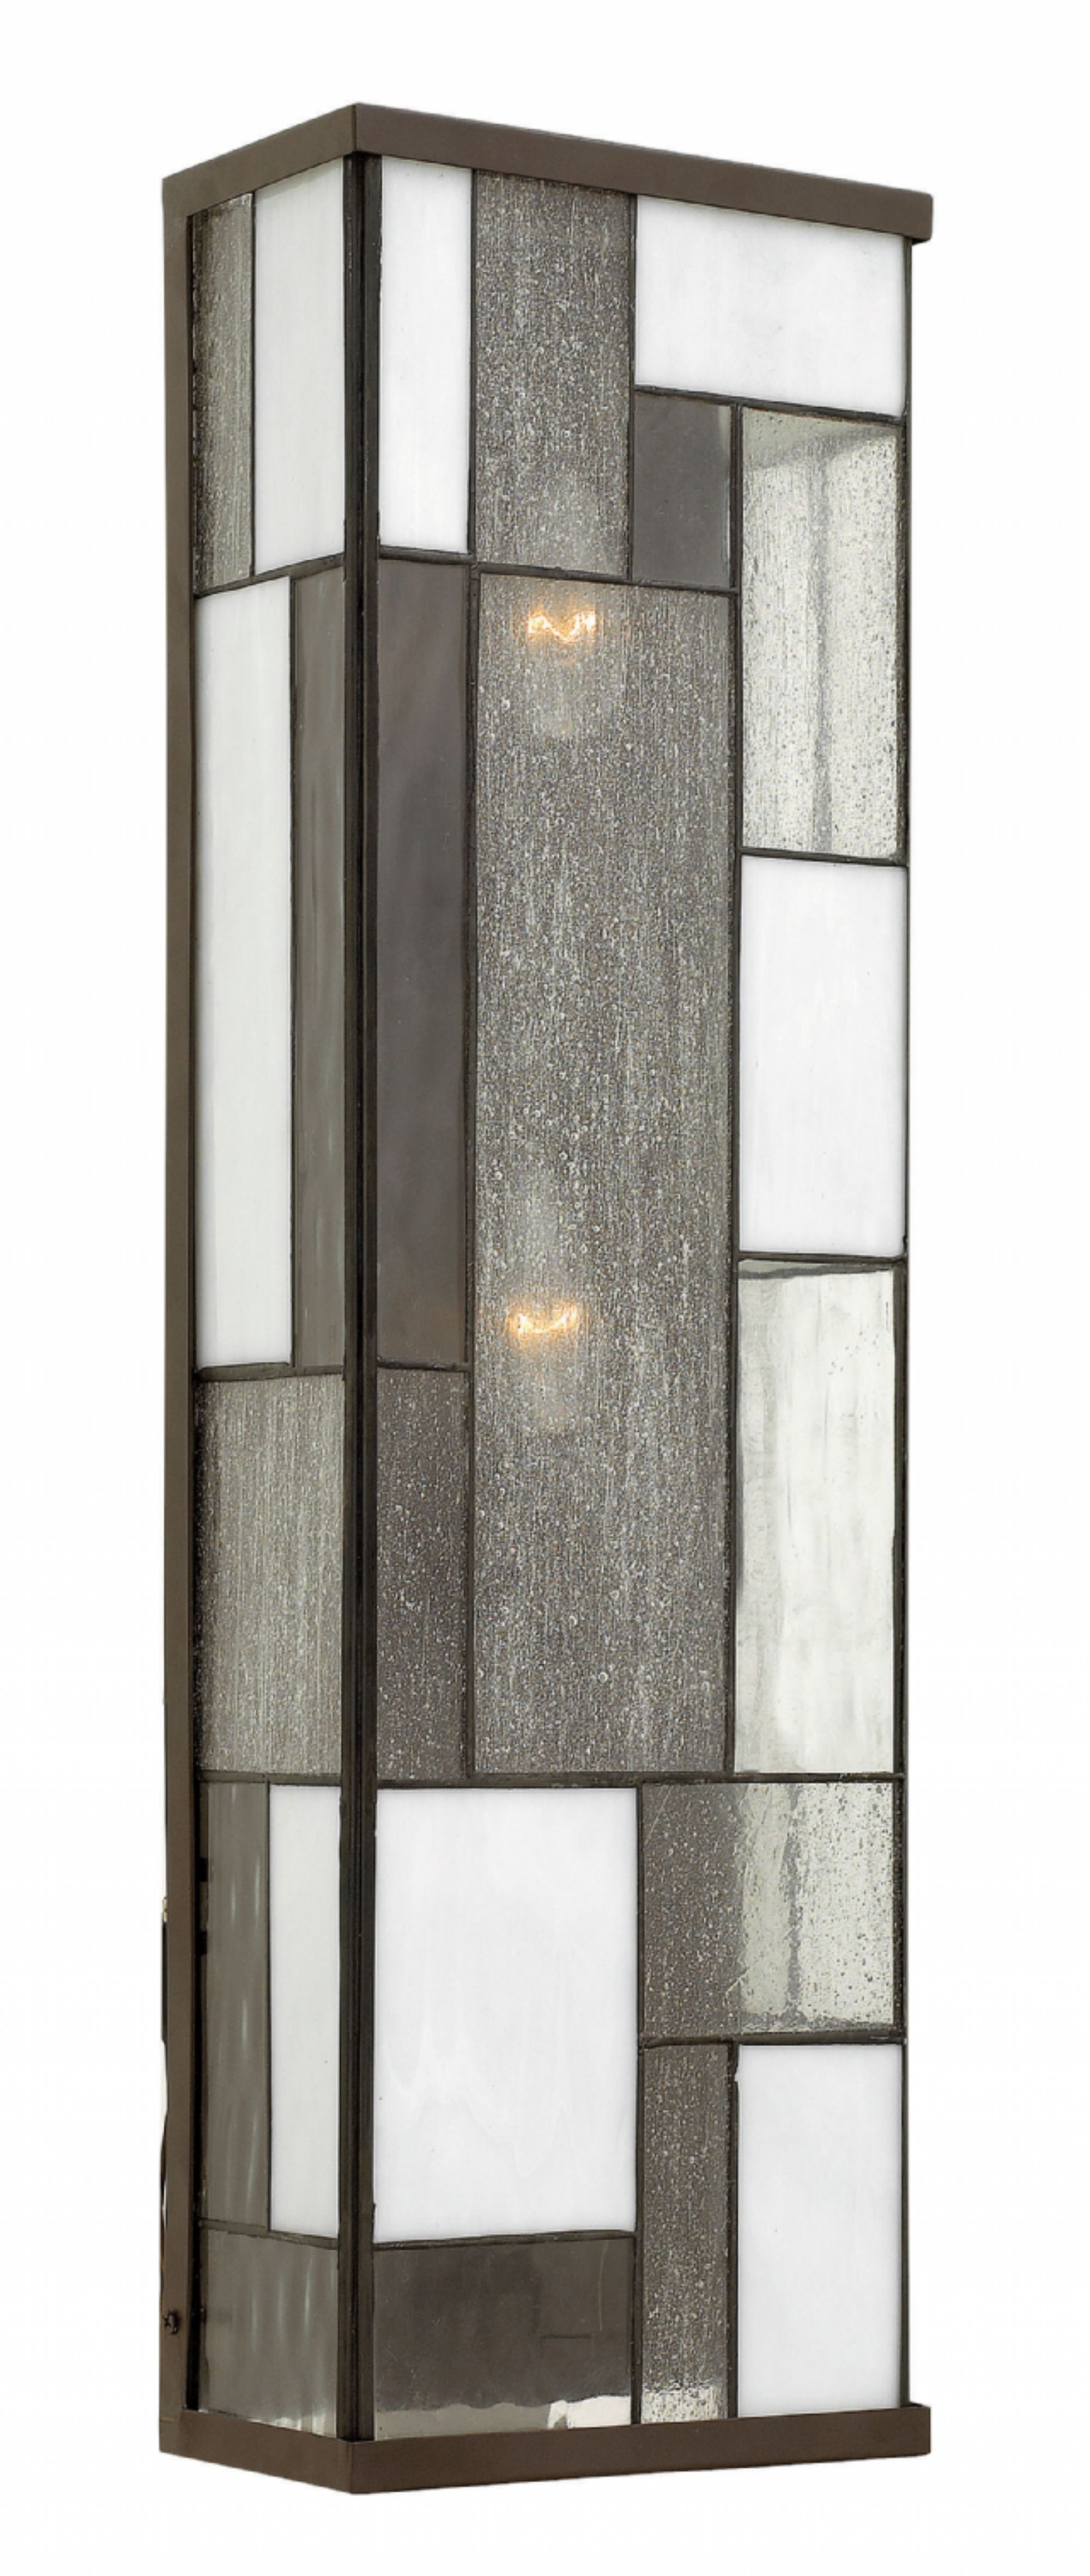 Hinkley Outdoor Wall Lighting For 2018 Buckeye Bronze Mondrian > Exterior Wall Mount (View 18 of 20)